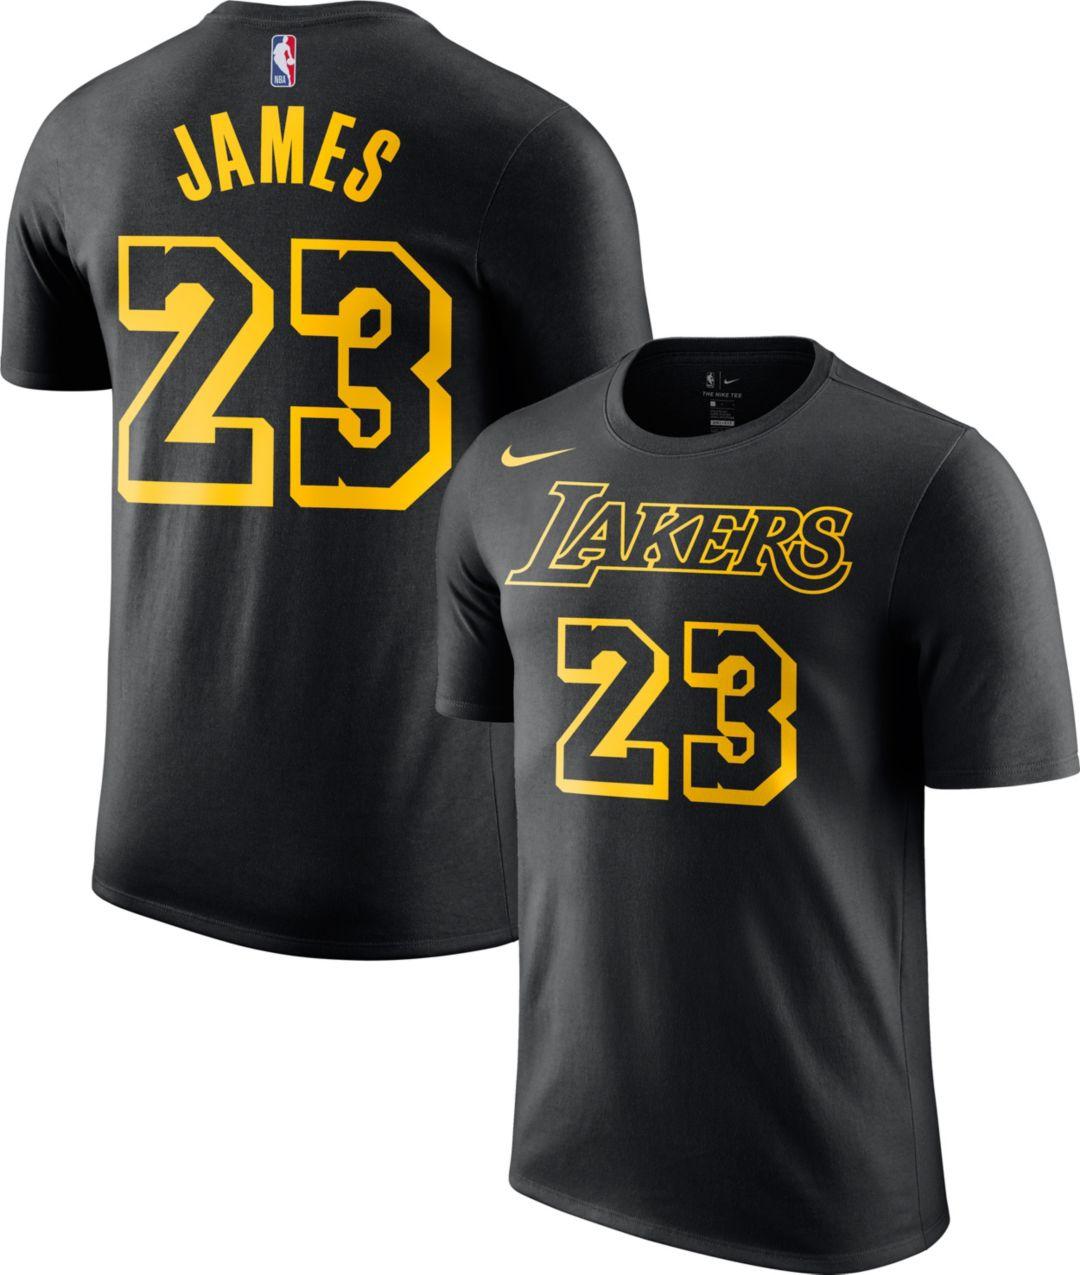 071cf191a Nike Men's Los Angeles Lakers LeBron James Dri-FIT City Edition T-Shirt 1